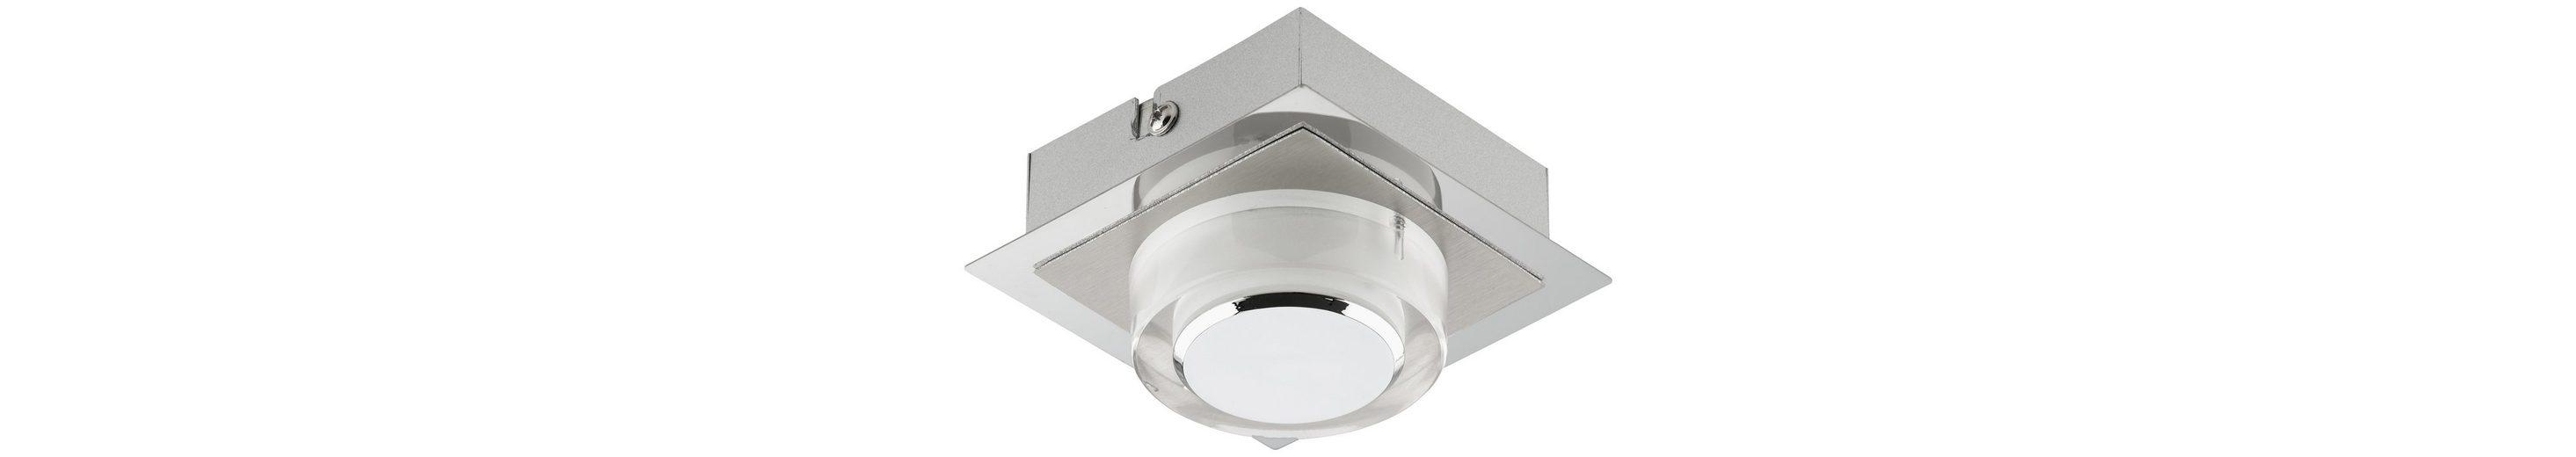 LED Wand-/Deckenleuchte »Orna«, 5W